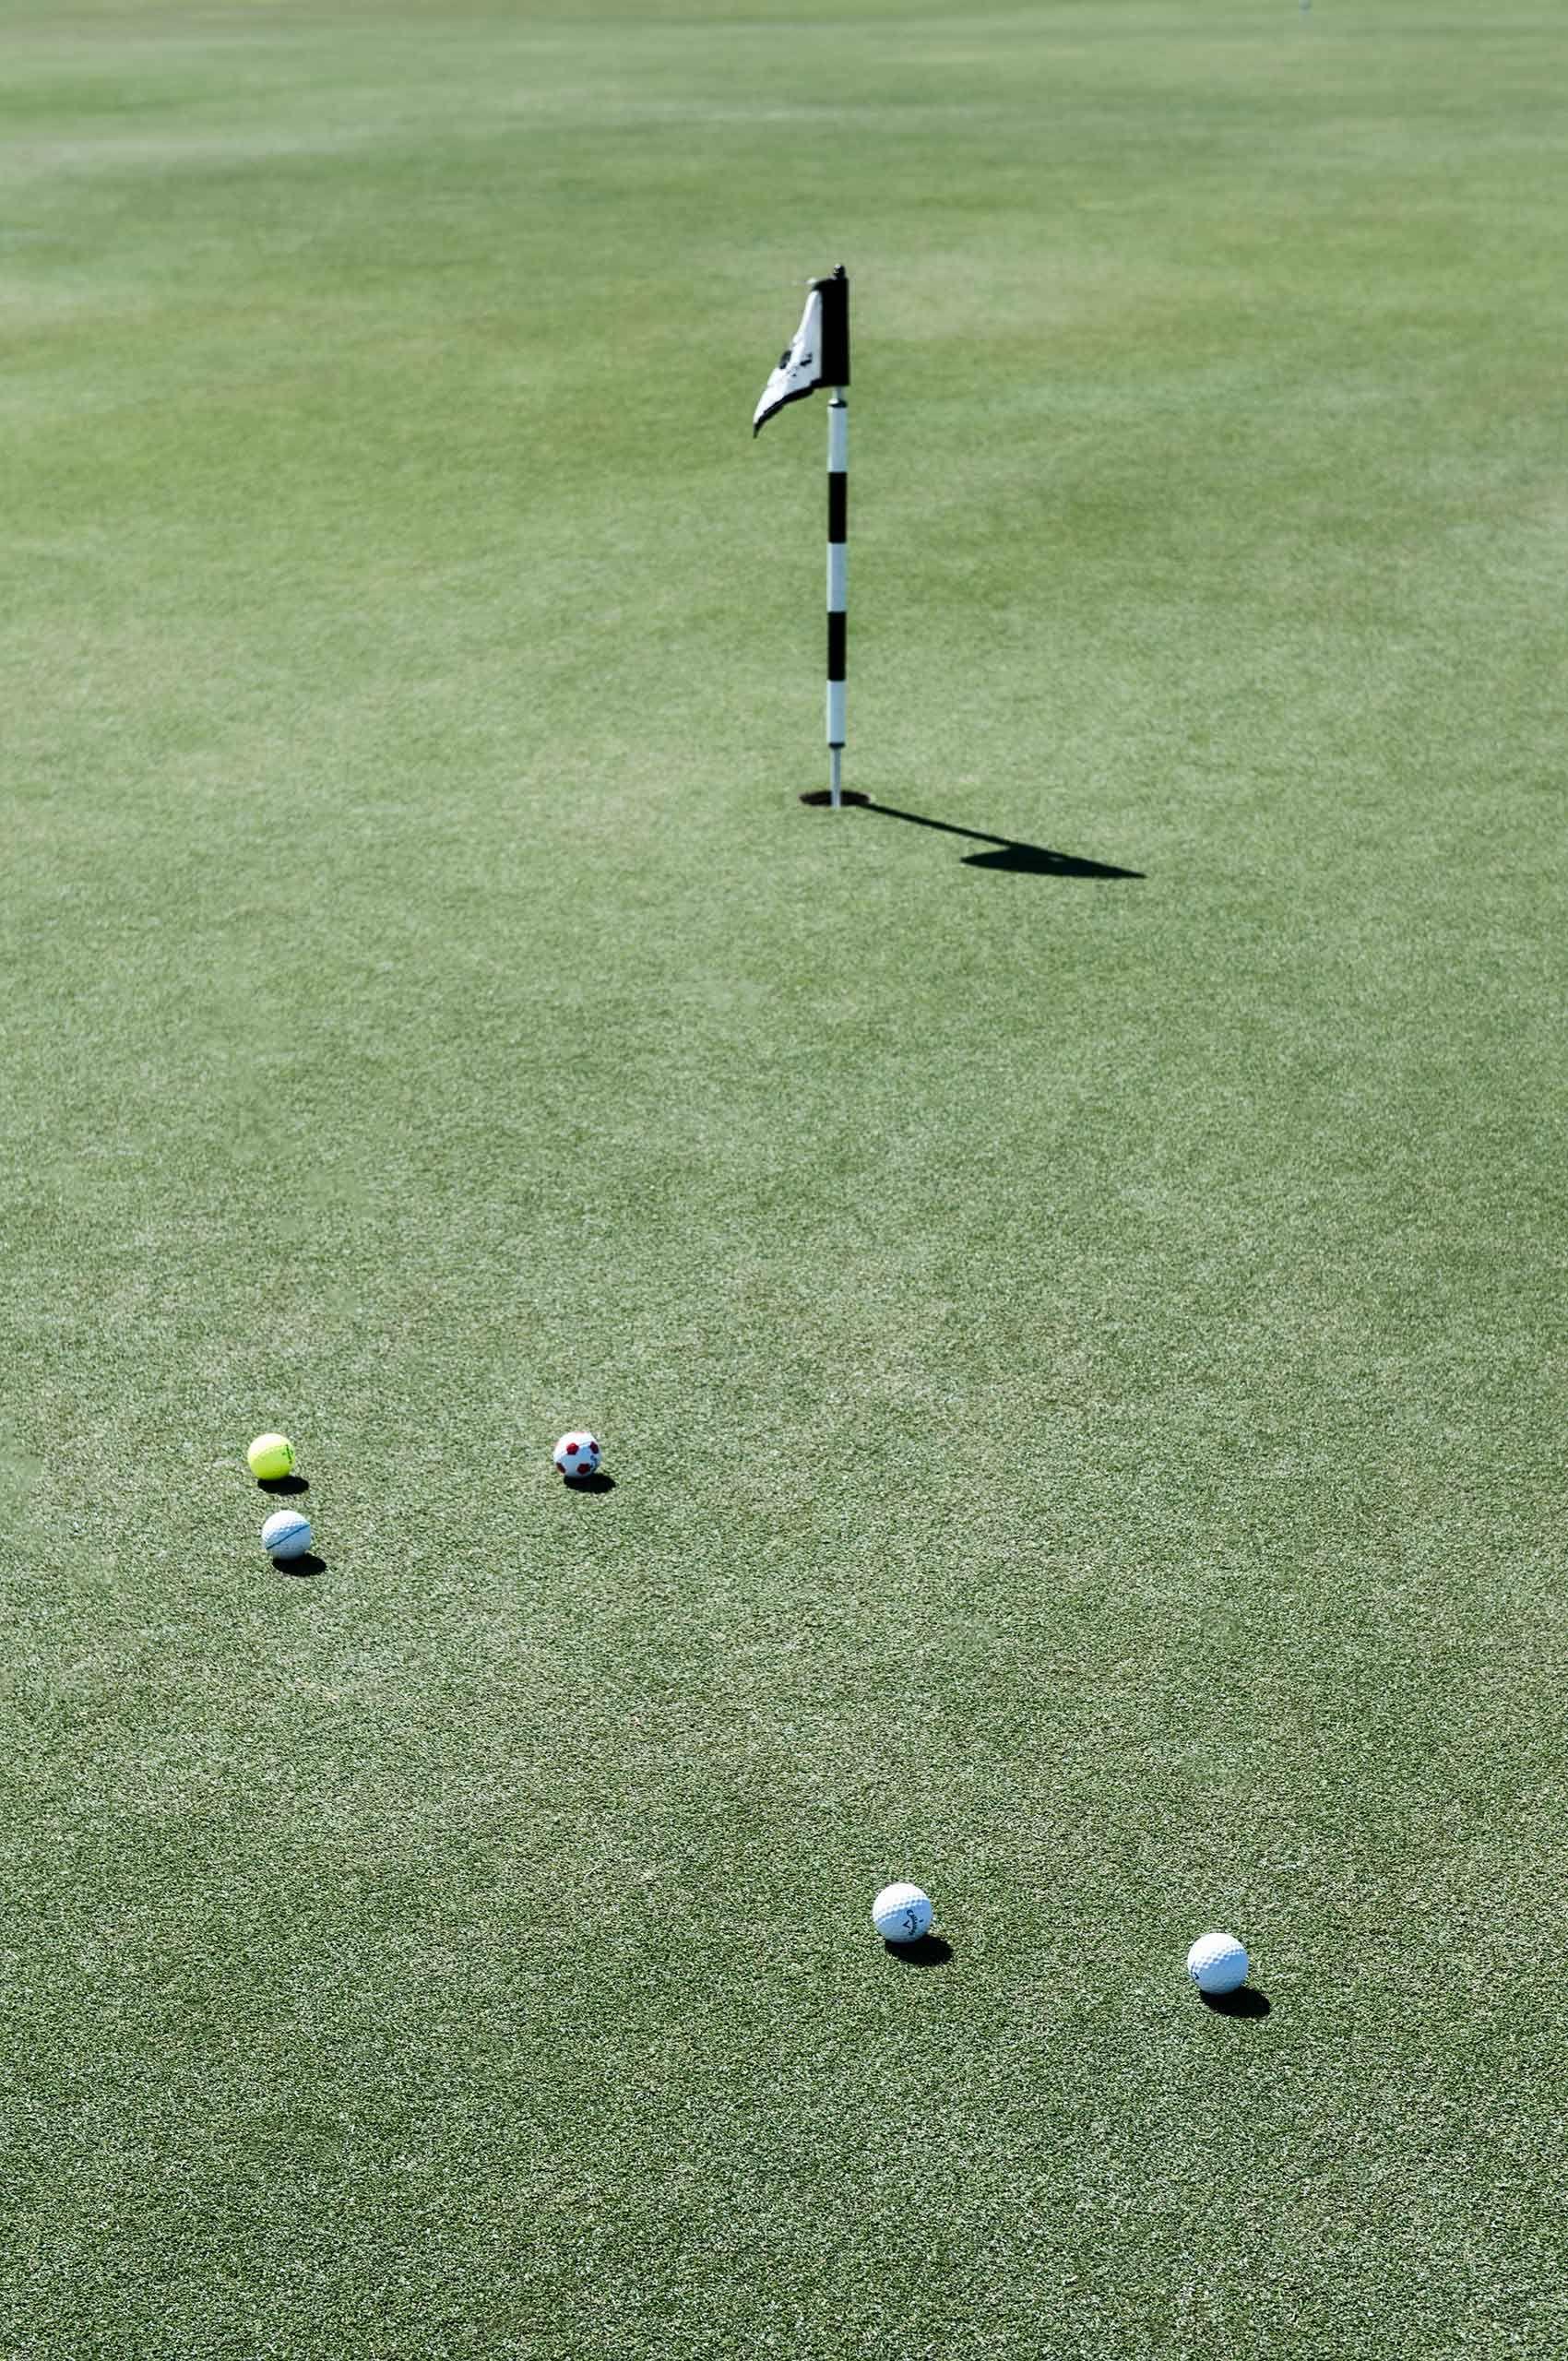 PuttingGreen-Golf-by-HenrikOlundPhotography.jpg